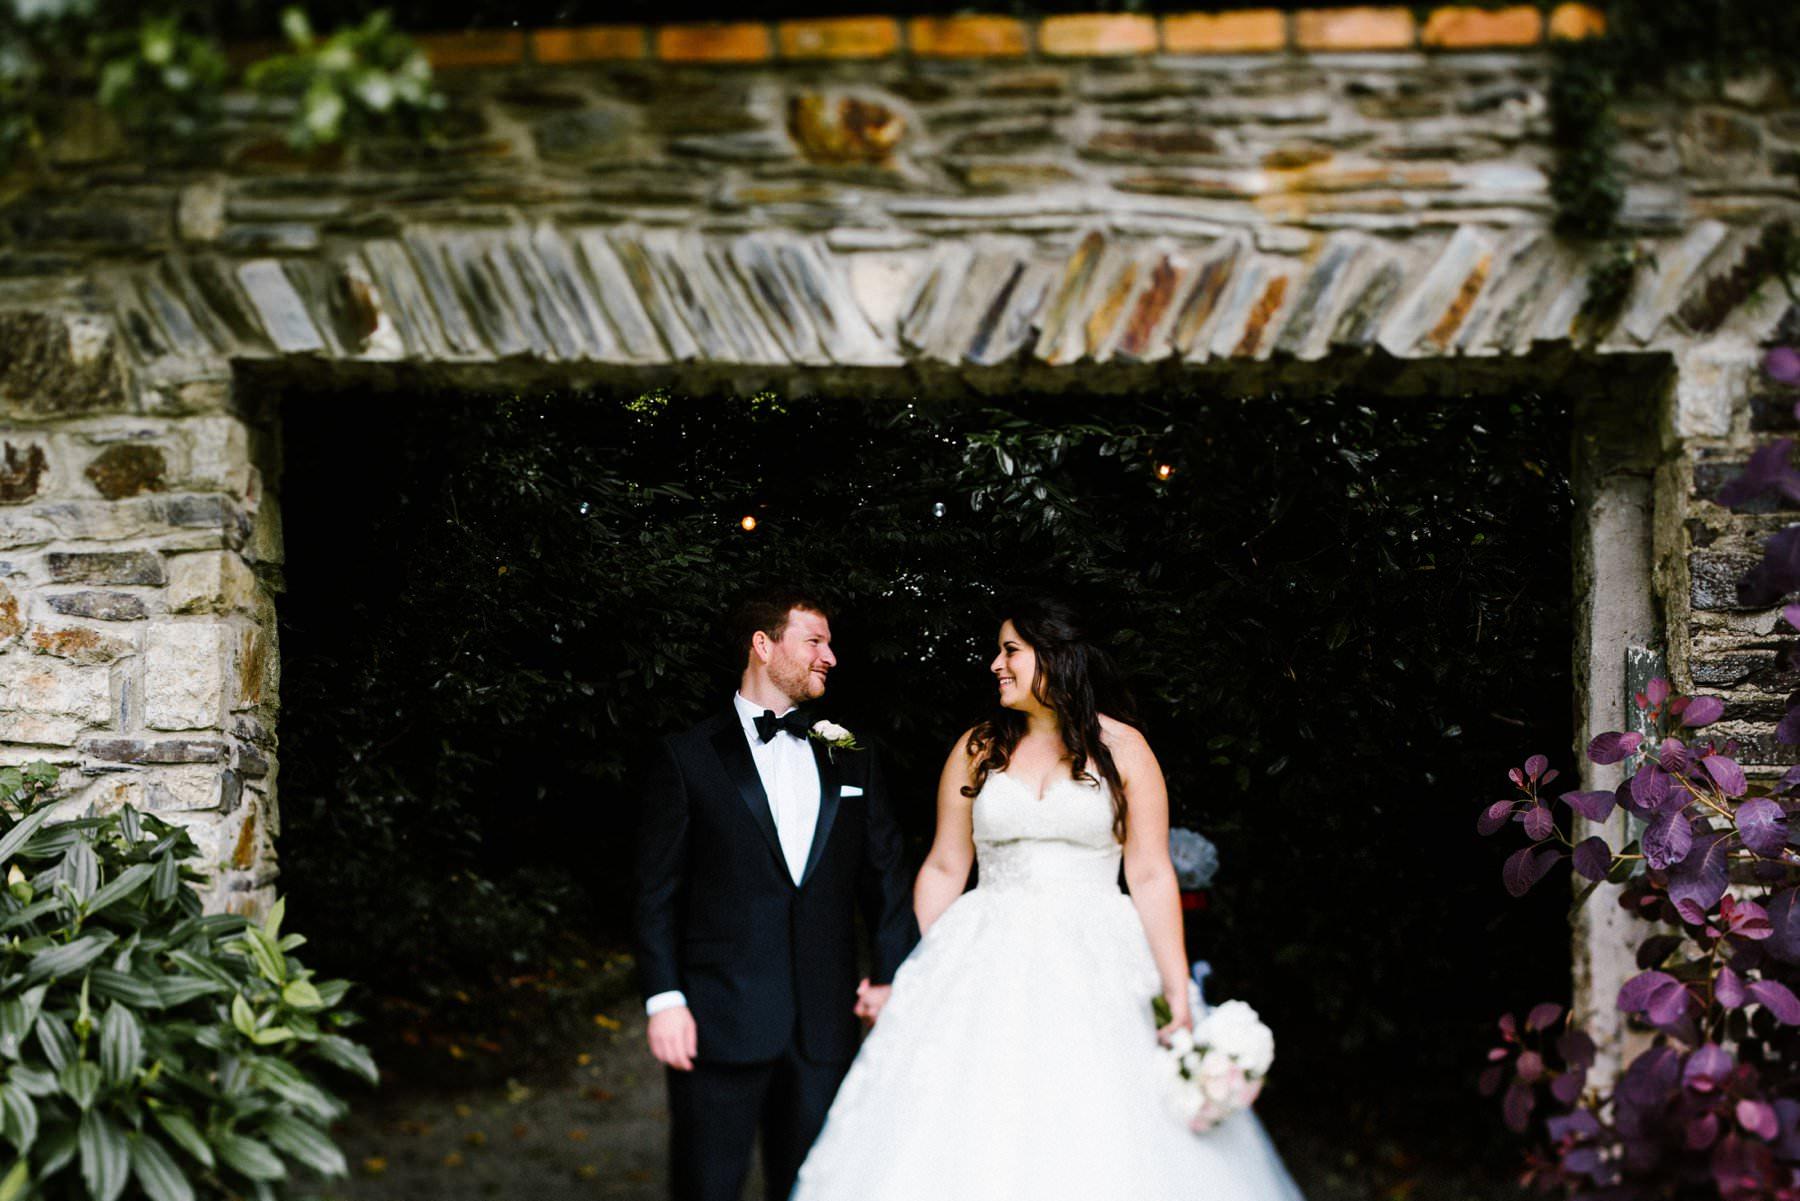 Shane and bryce wedding